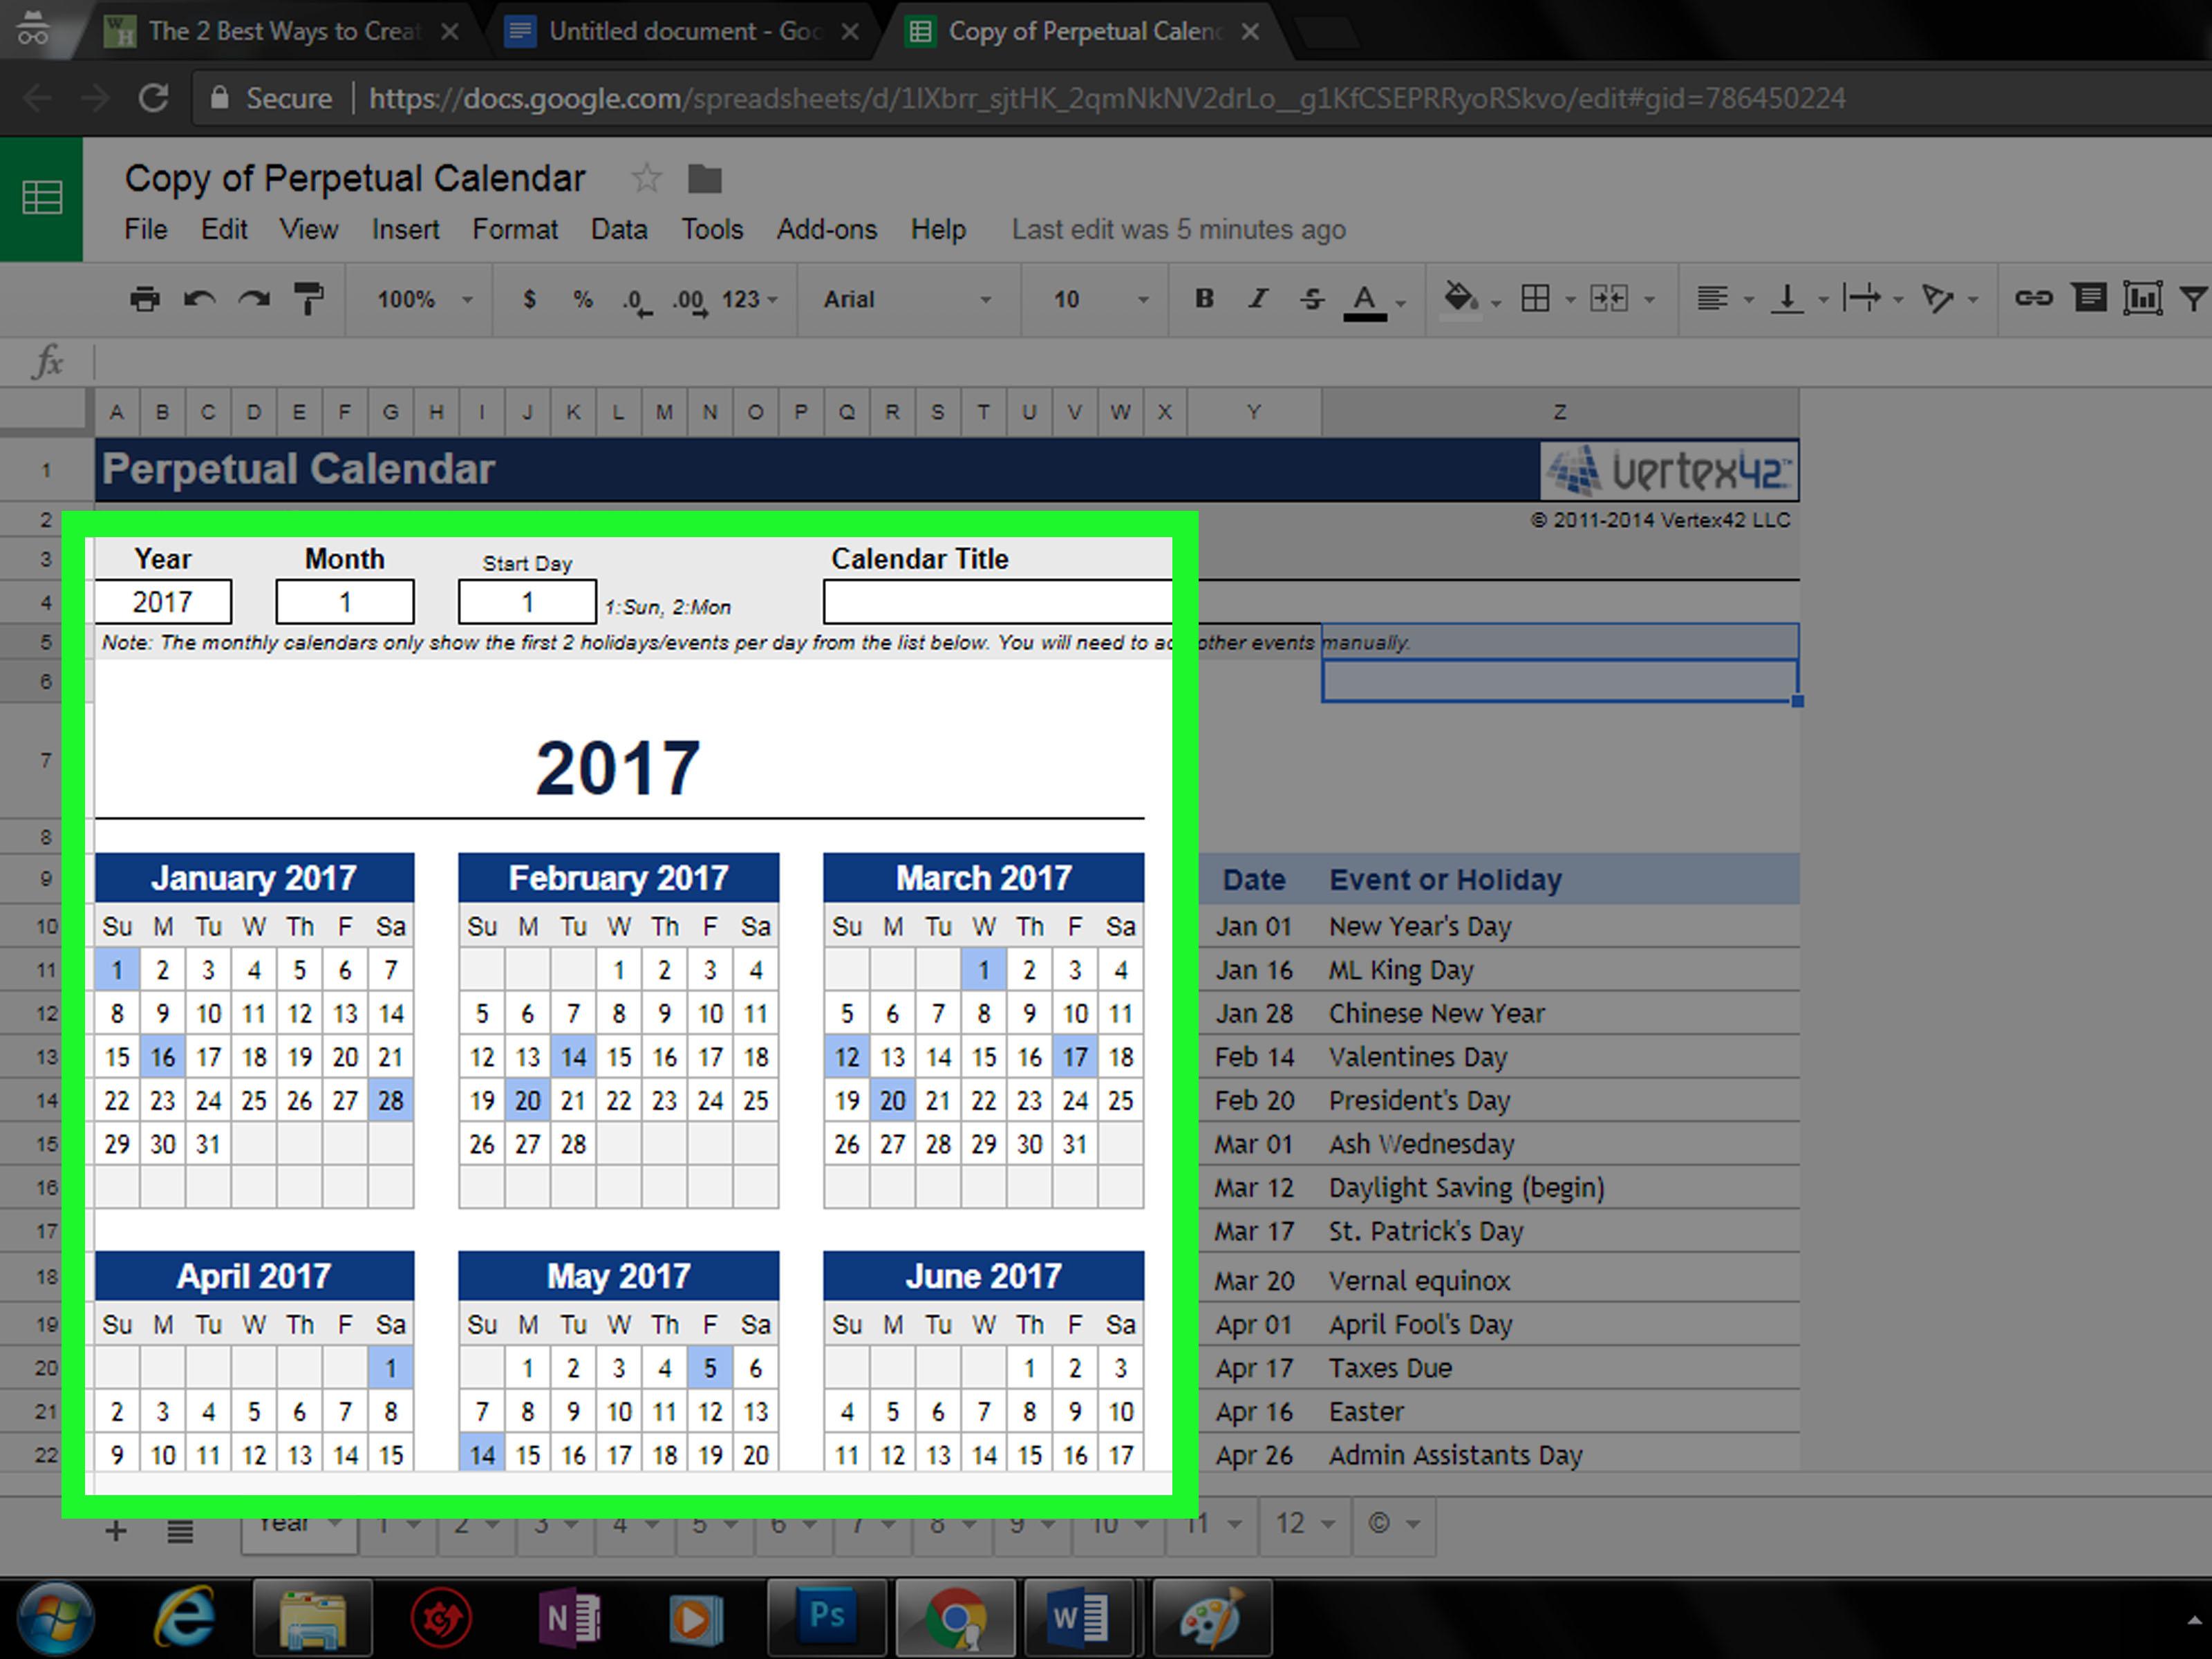 google docs 2019 calendar